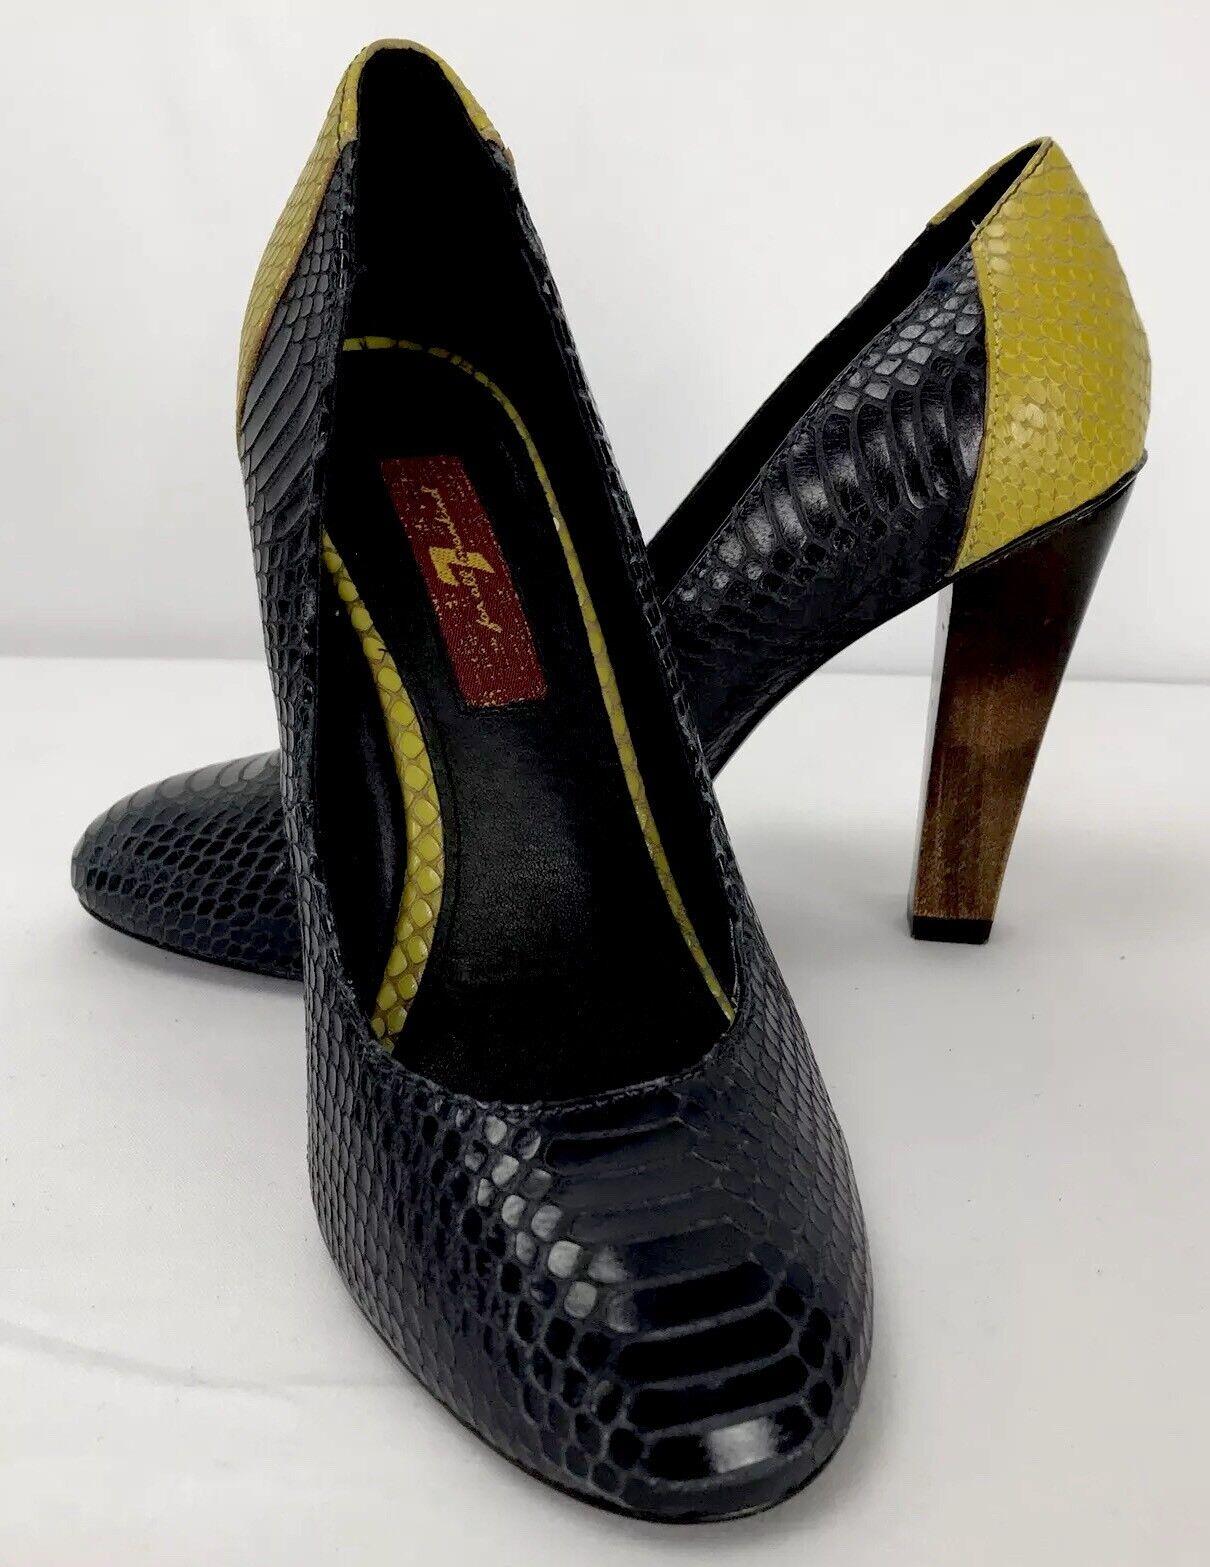 7 For All Mankind Veta Round Toe Pumps Snake Skin Yellow Black Wooden Heel Sz 6M